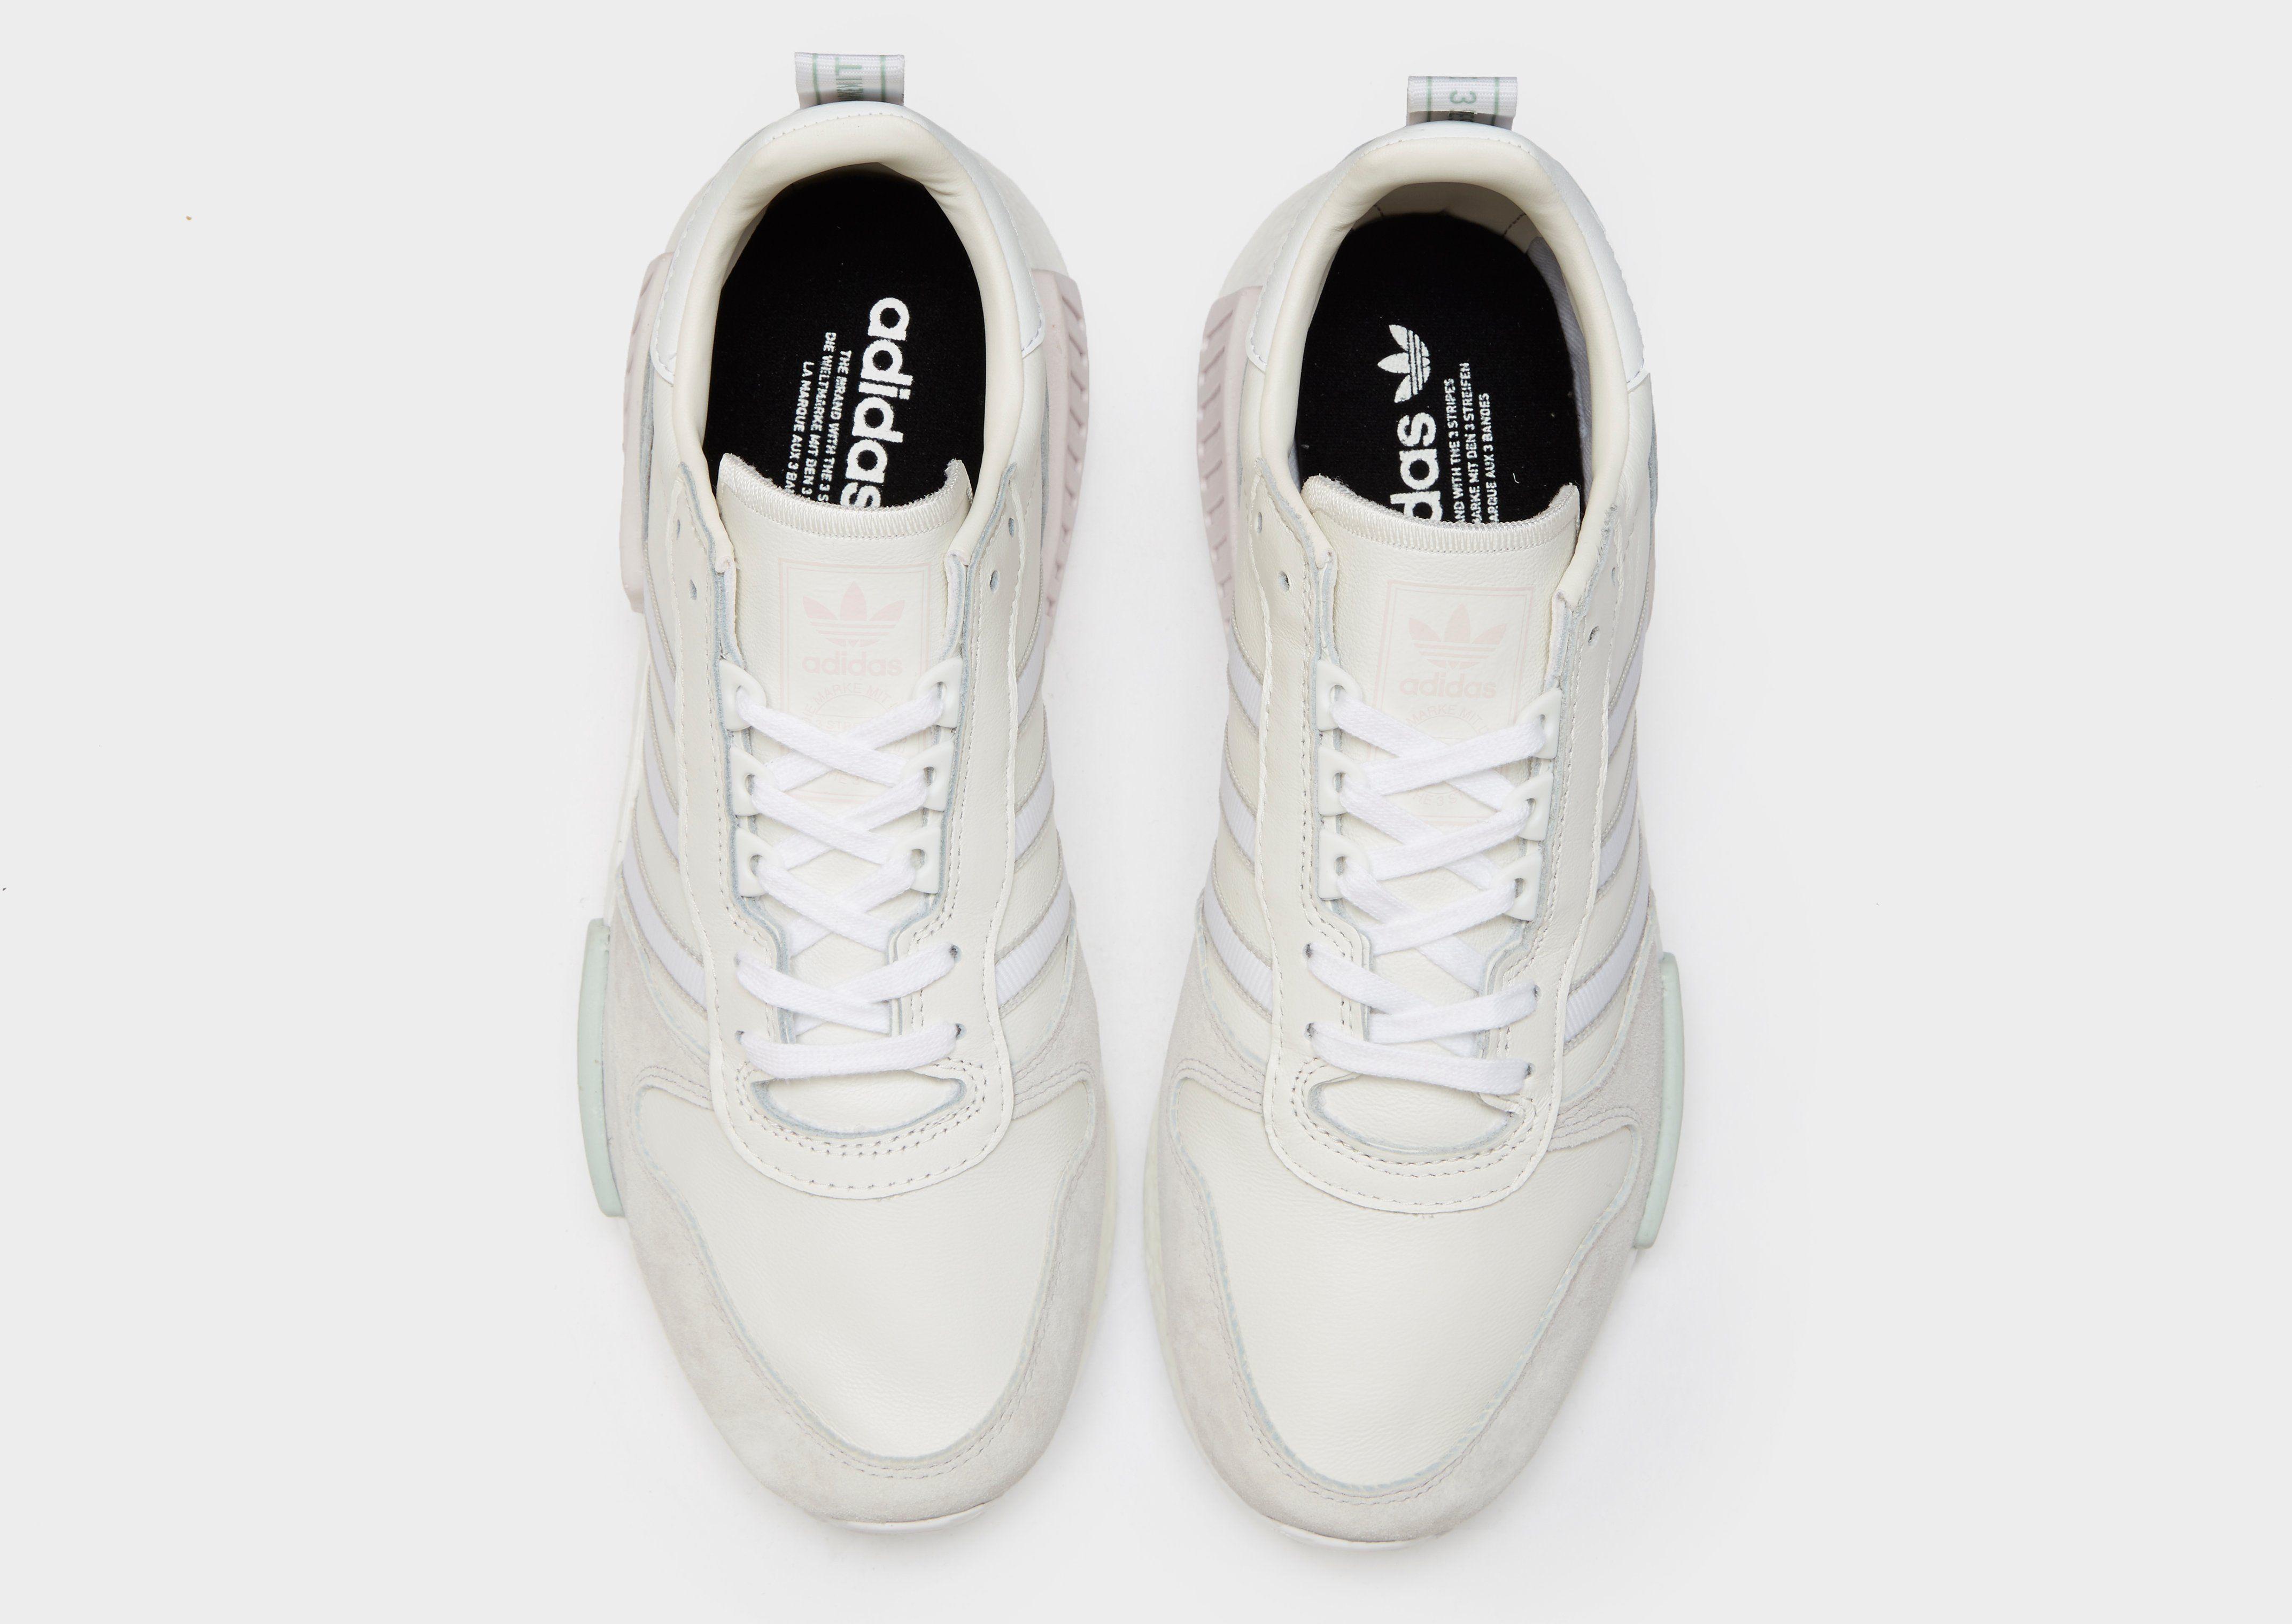 adidas Originals Rising Star XR1